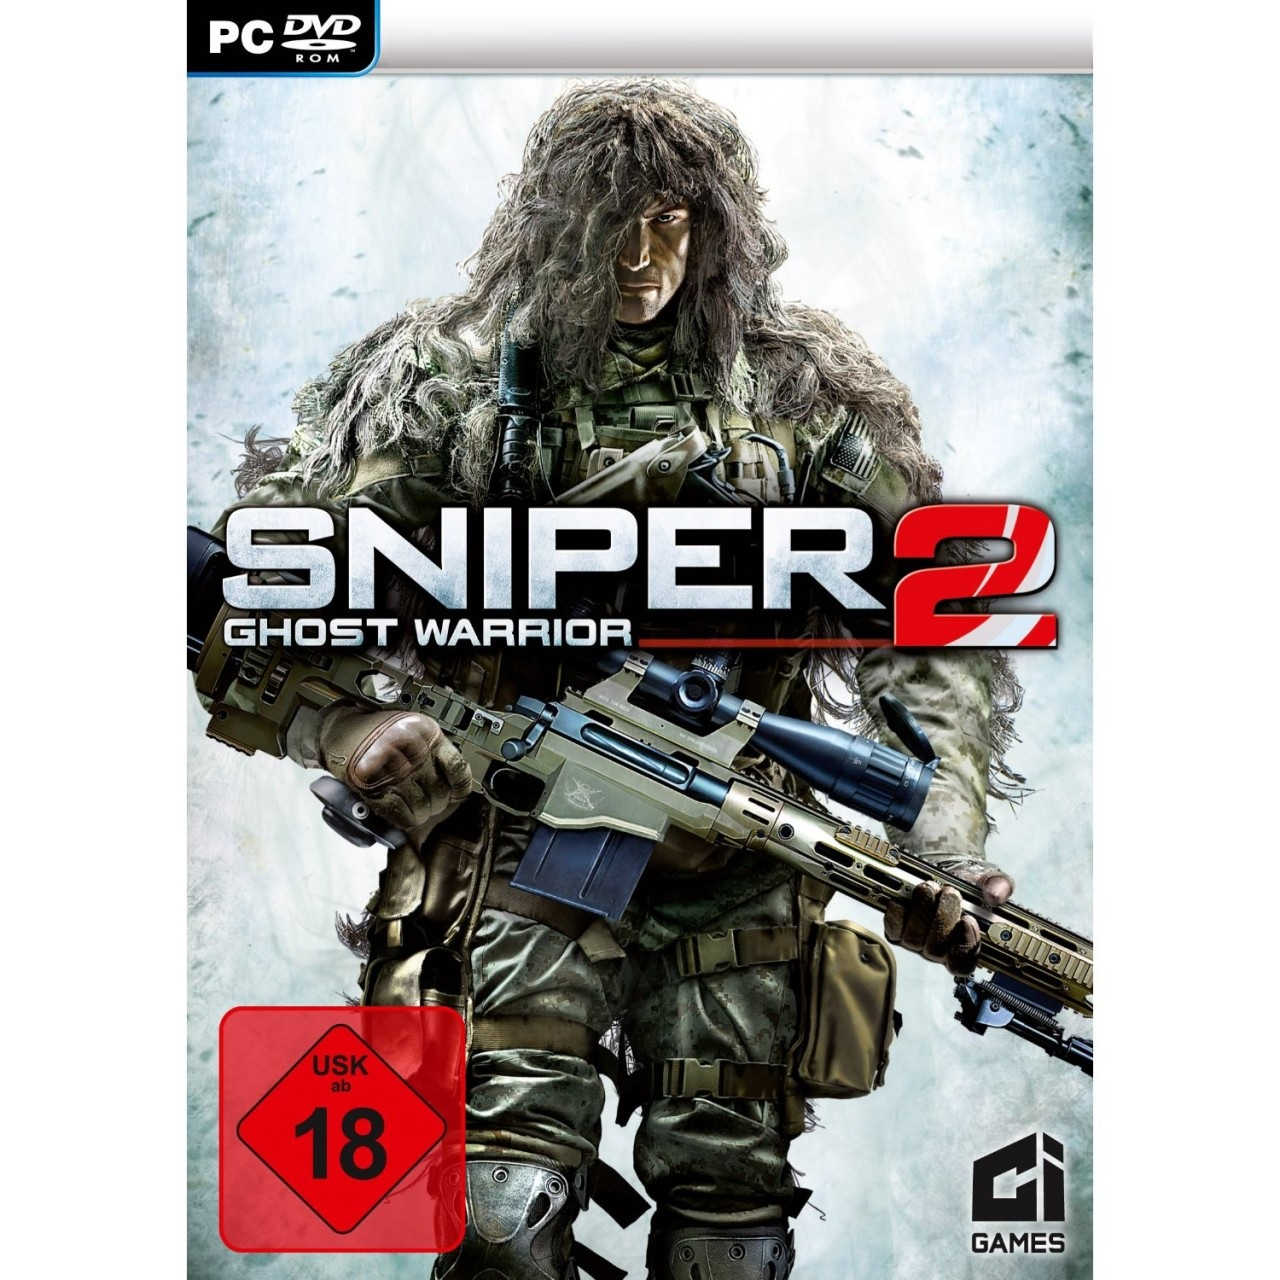 بازی Sniper Ghost Warrior 2-- تیرانداز جنگجو 2